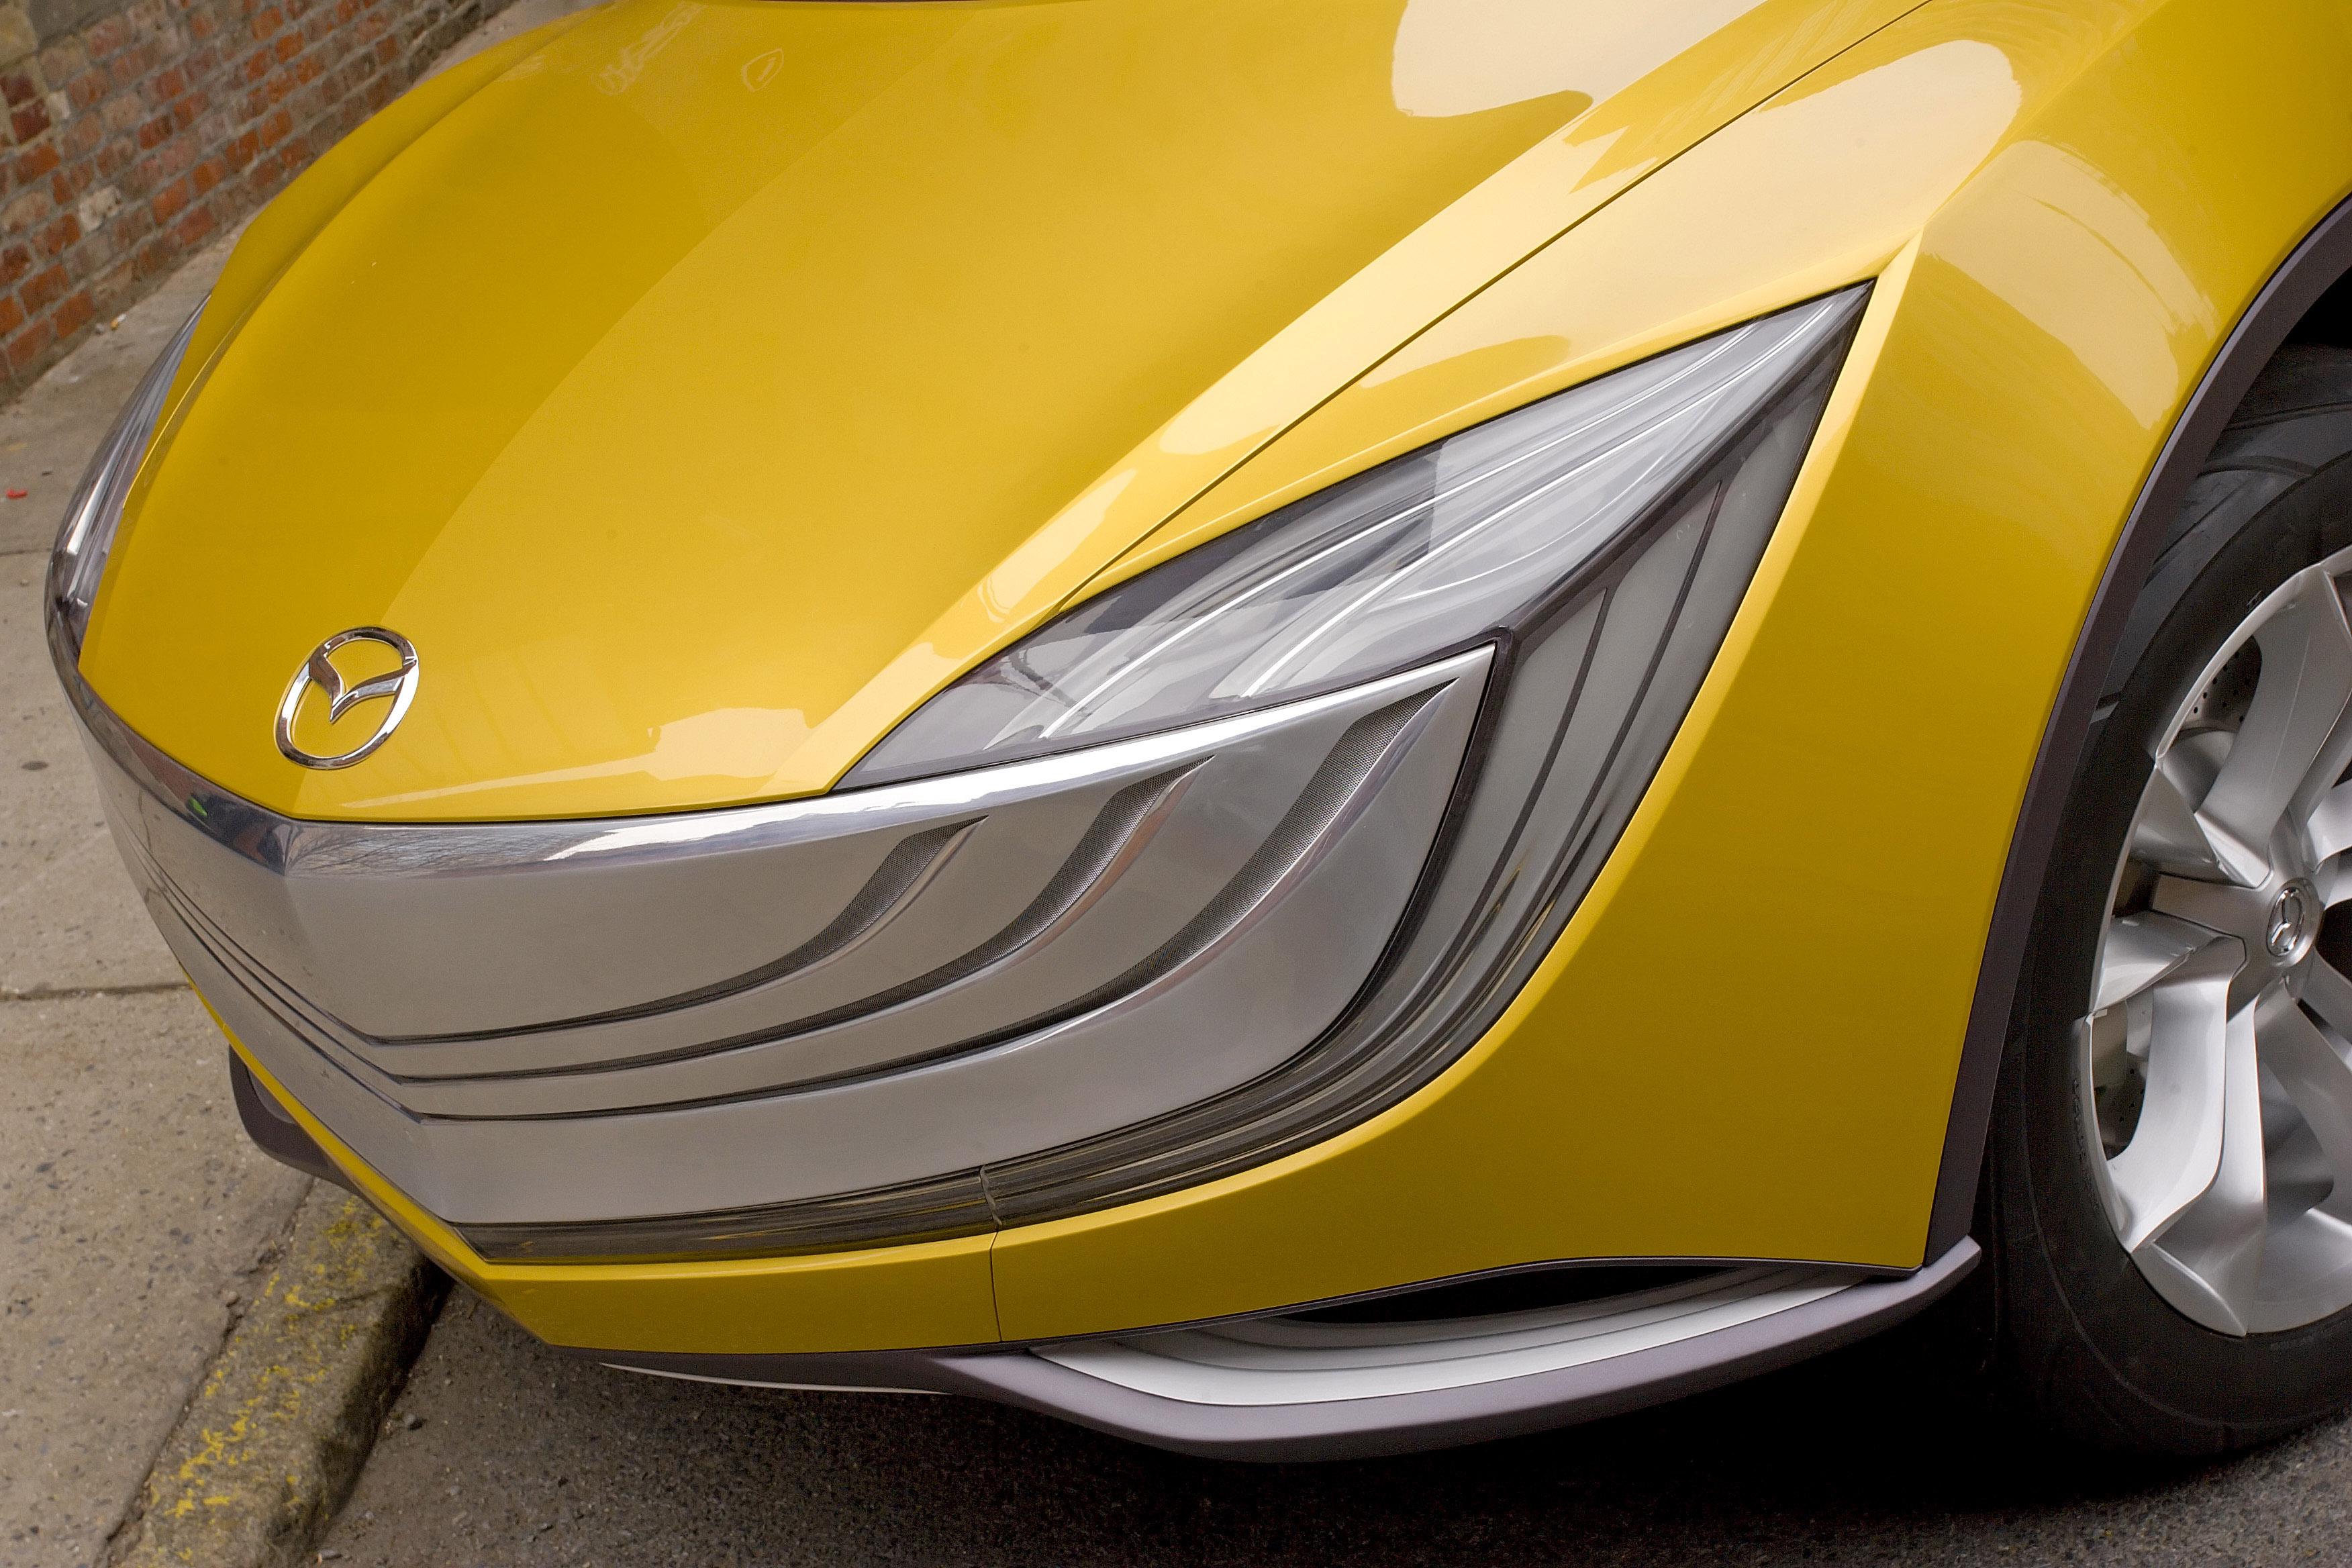 https://www.automobilesreview.com/gallery/mazda-hakaze-concept/mazda-hakaze-concept-08.jpg